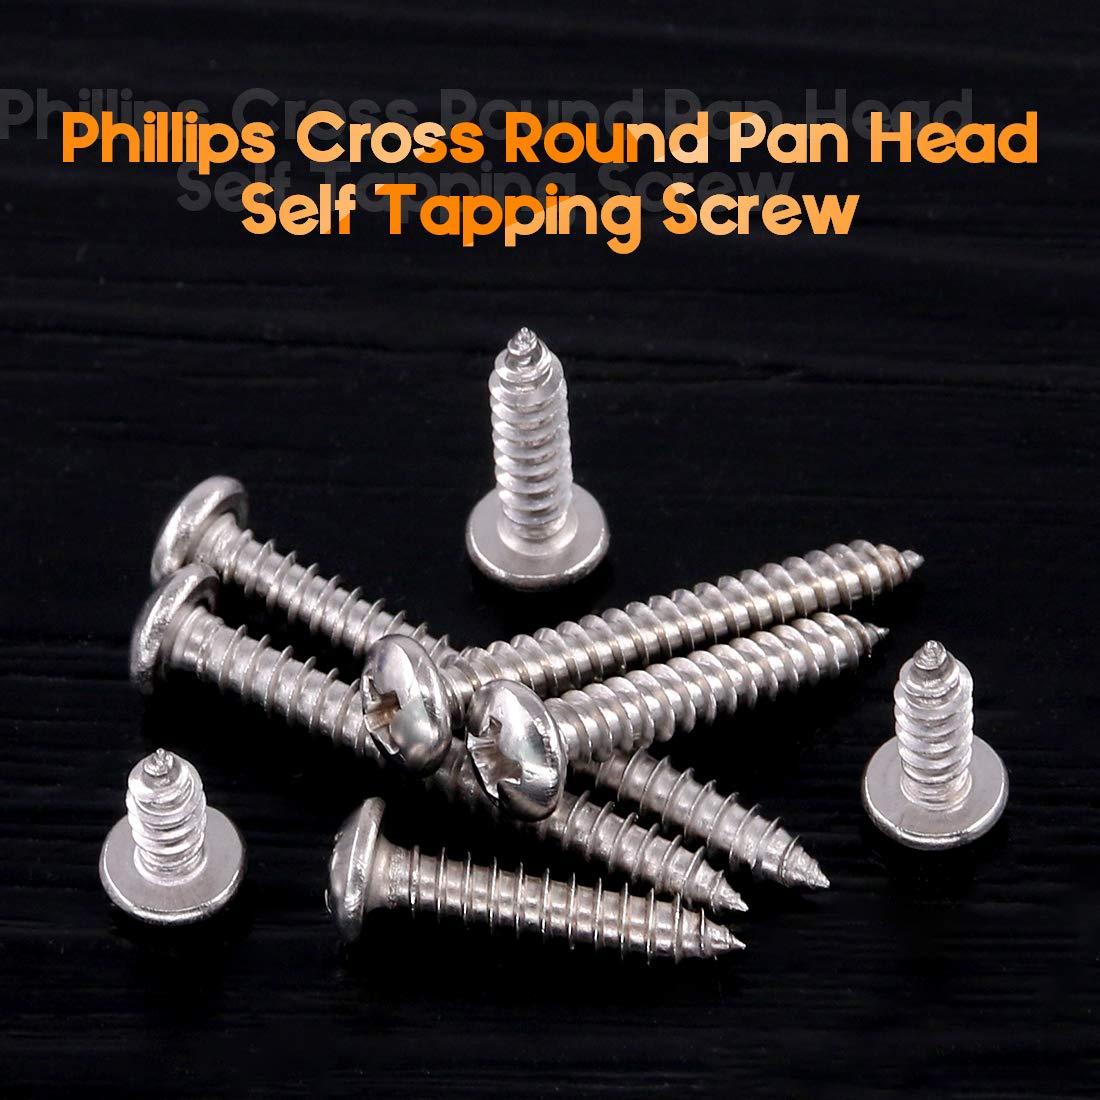 Rustark 180-Pcs #8 3//8 to 1-1//2 304 Stainless Steel Round Pan Head Phillips Cross Wood Screws Self Tapping Drilling Screws Assortment Kit